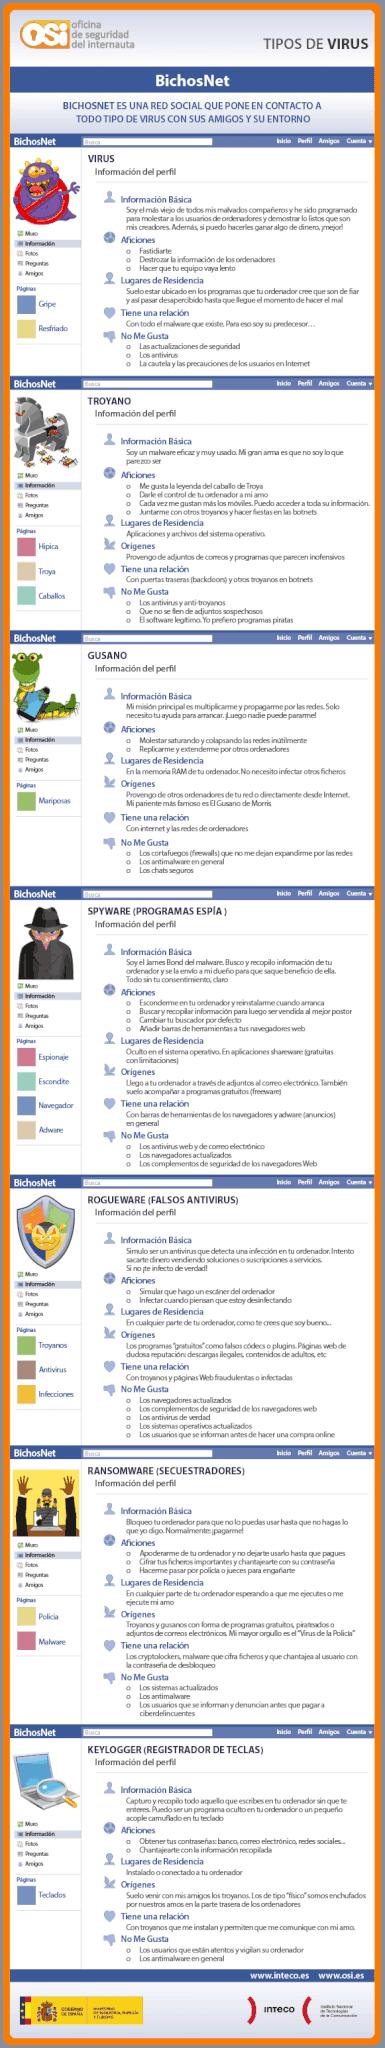 infografia-tipos-virus-informaticos